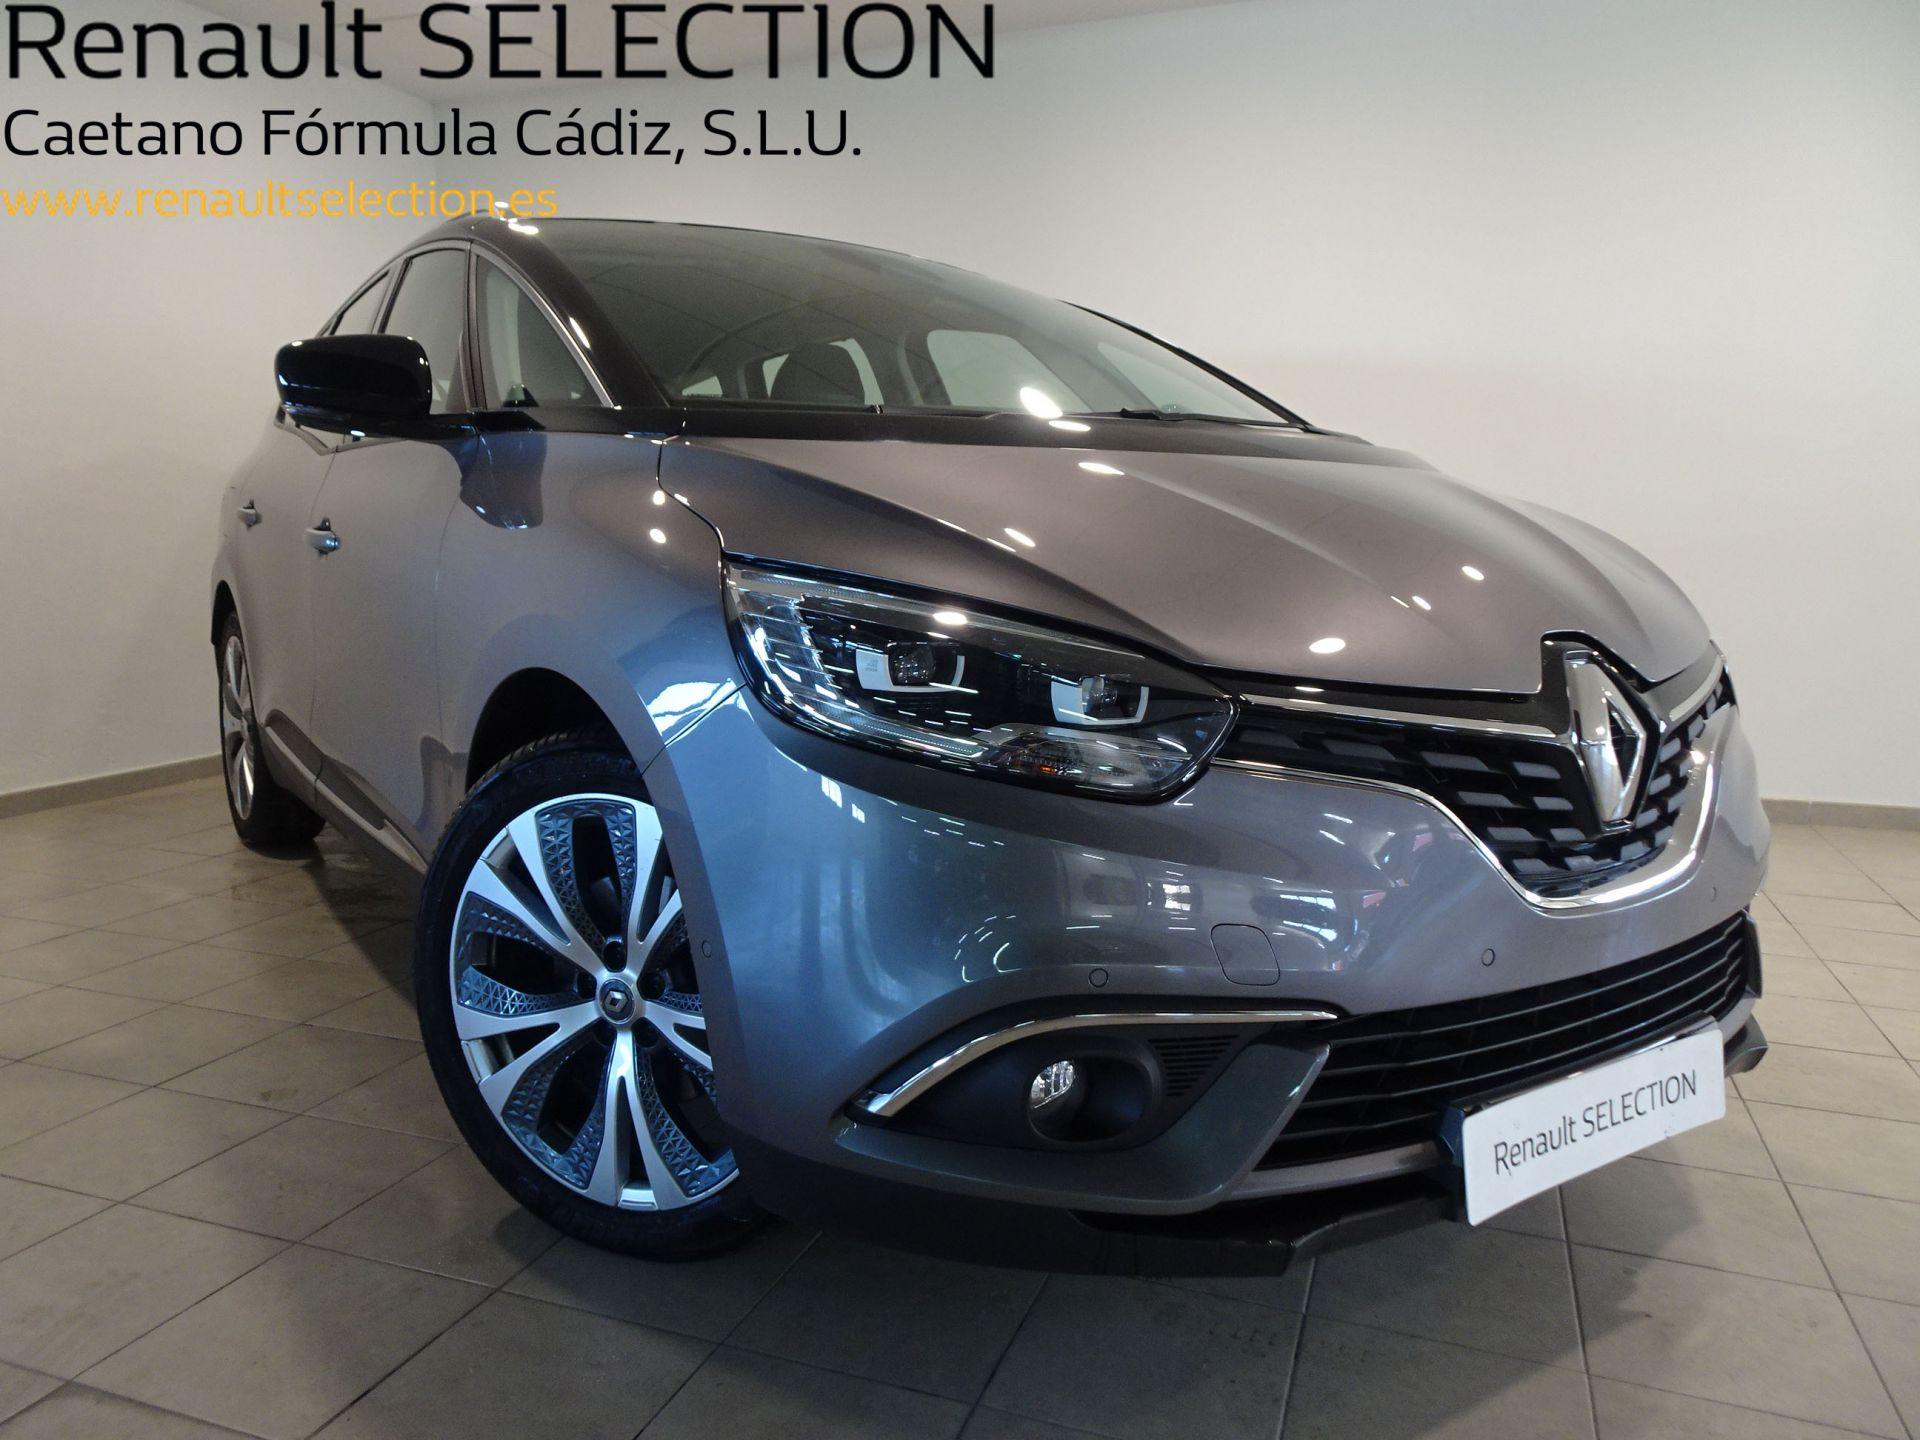 Renault Grand Scenic Zen Blue dCi 110 kW (150CV) - SS segunda mano Cádiz